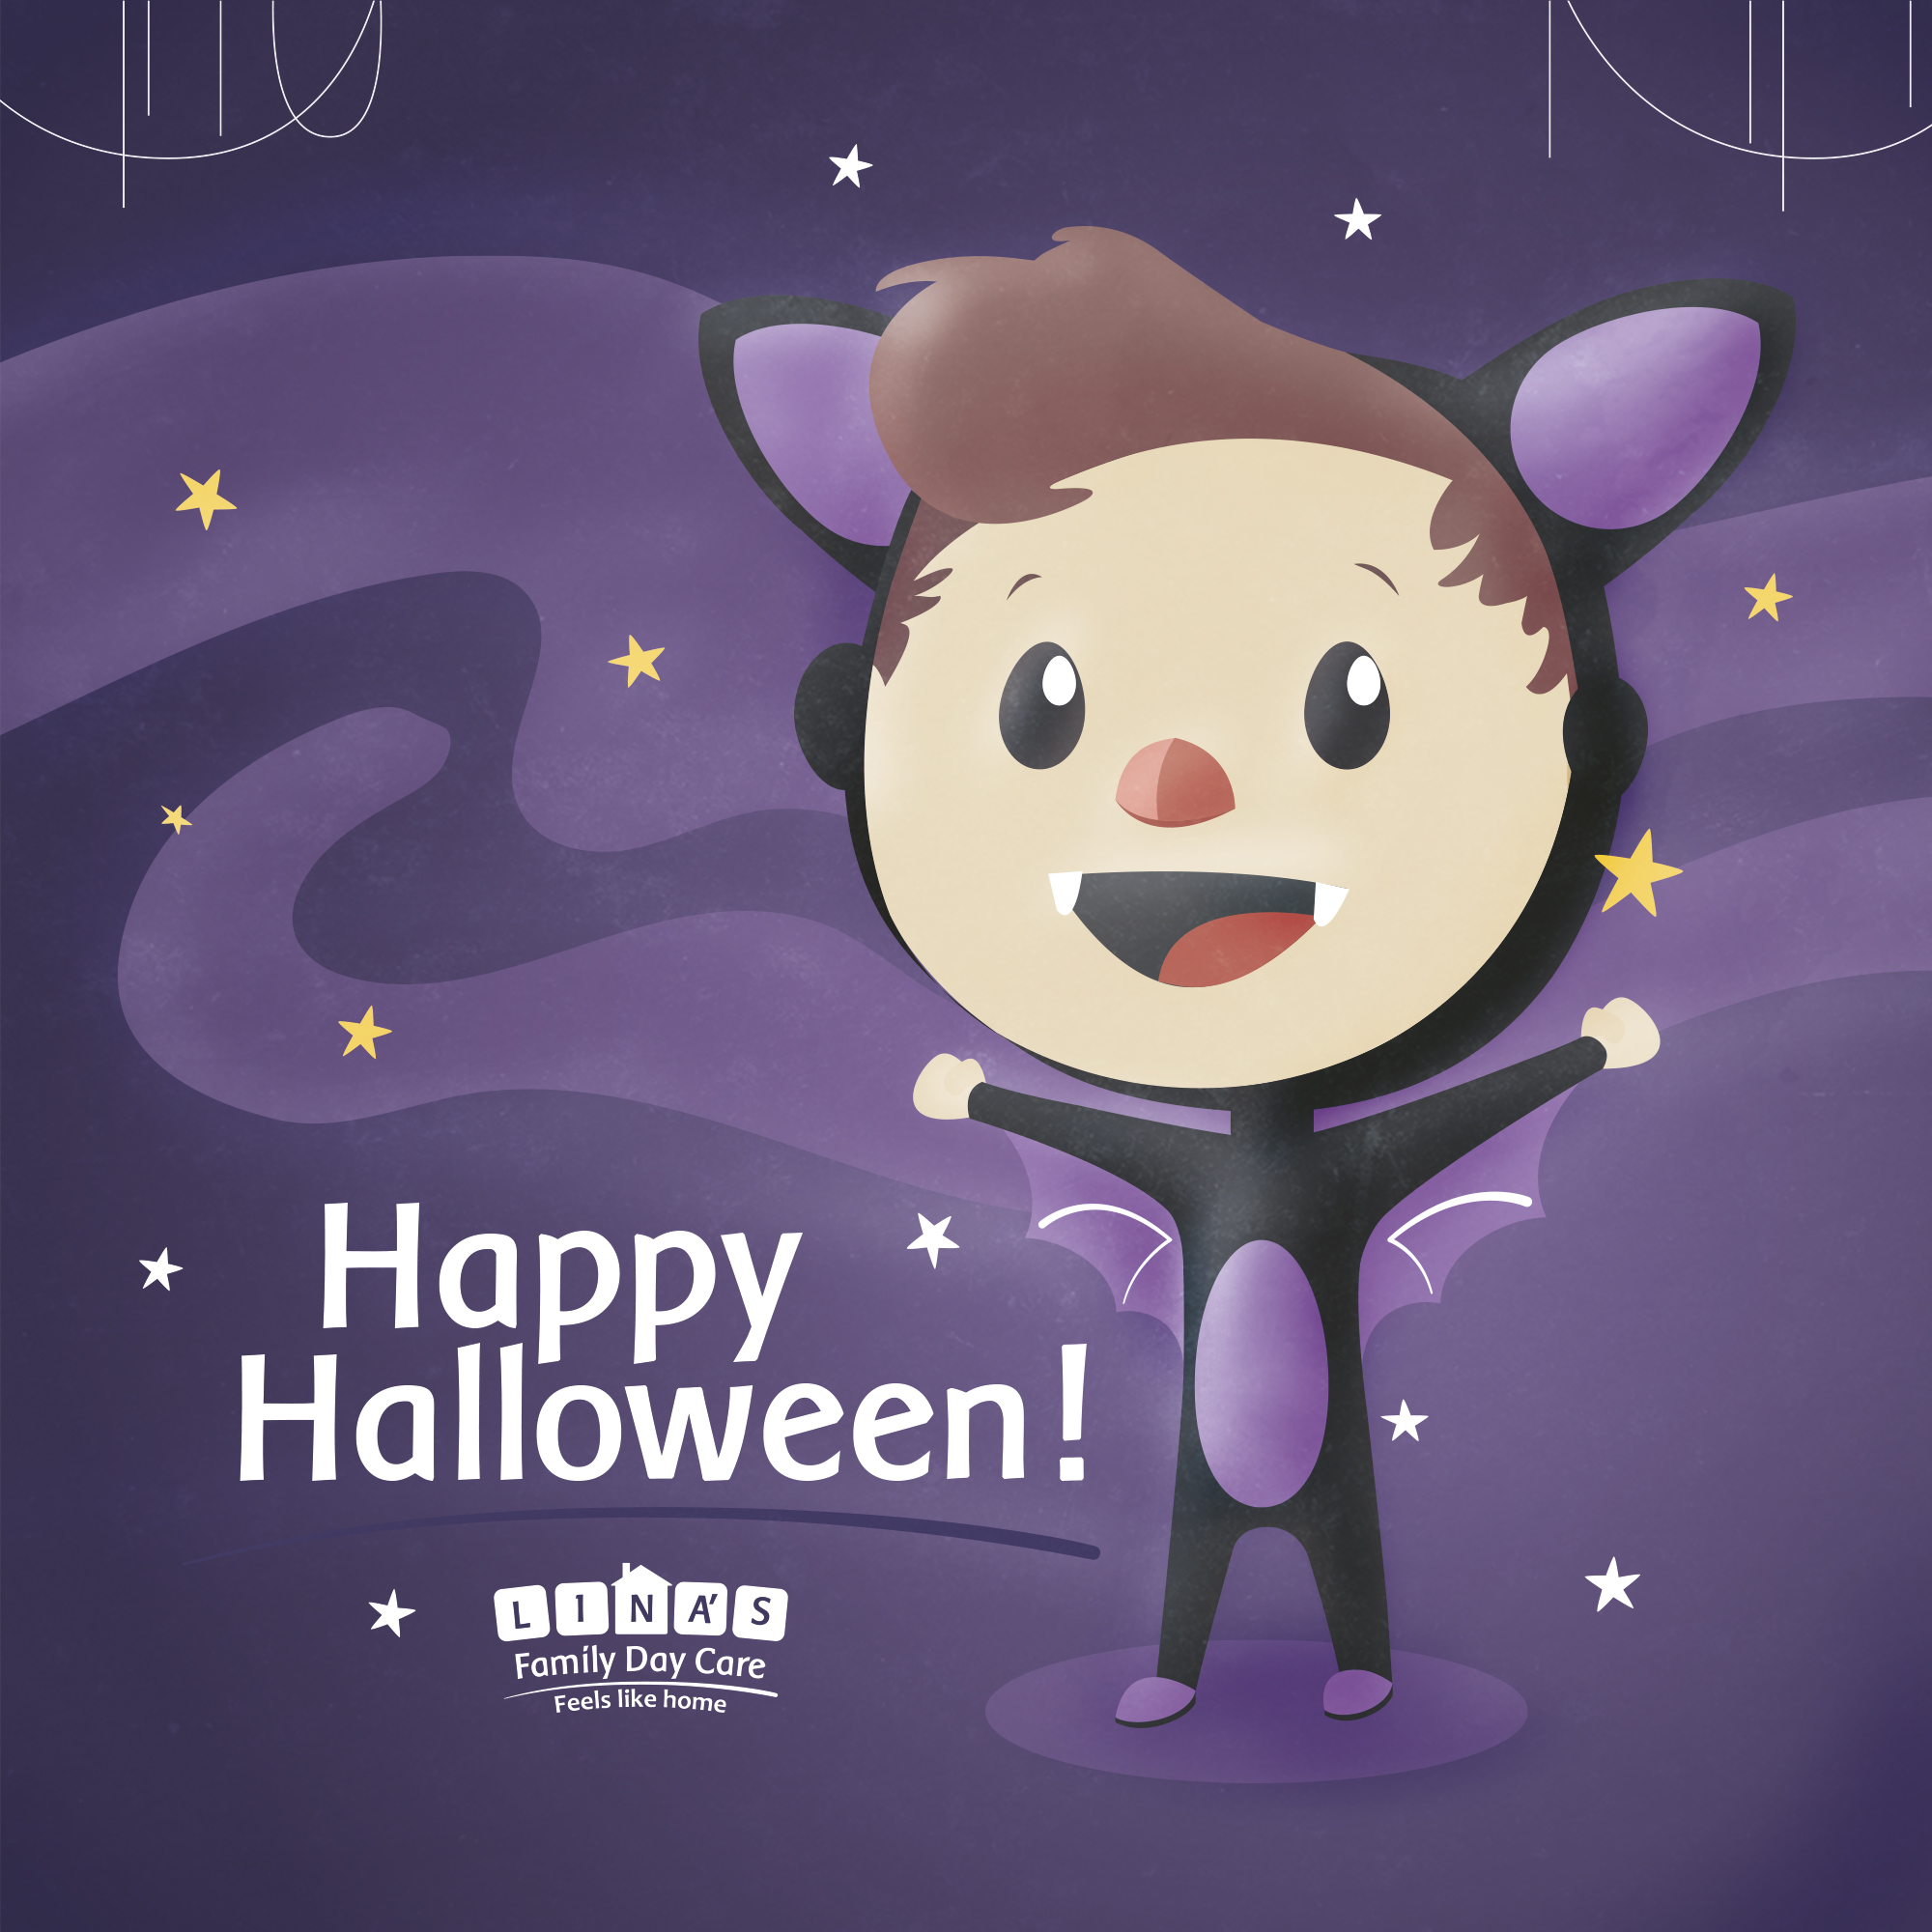 17_10_31_Happy_Halloween_Linas_Family_Day_Care_2